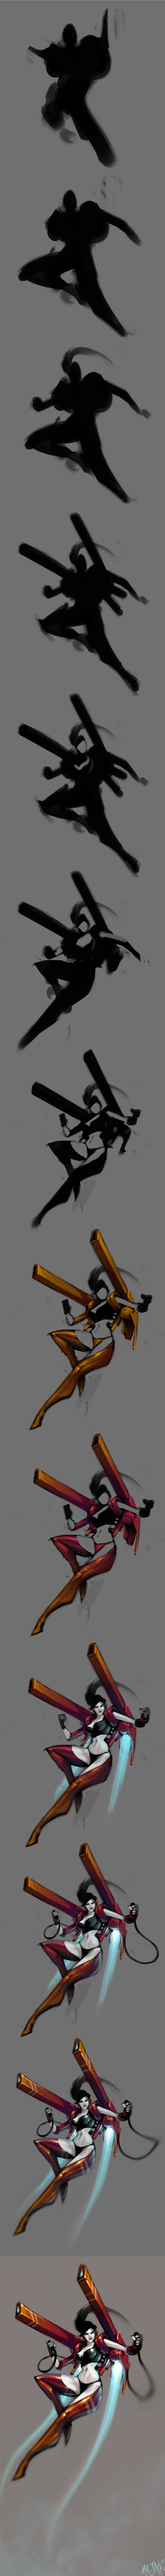 Booster Progress by Mr--Jack